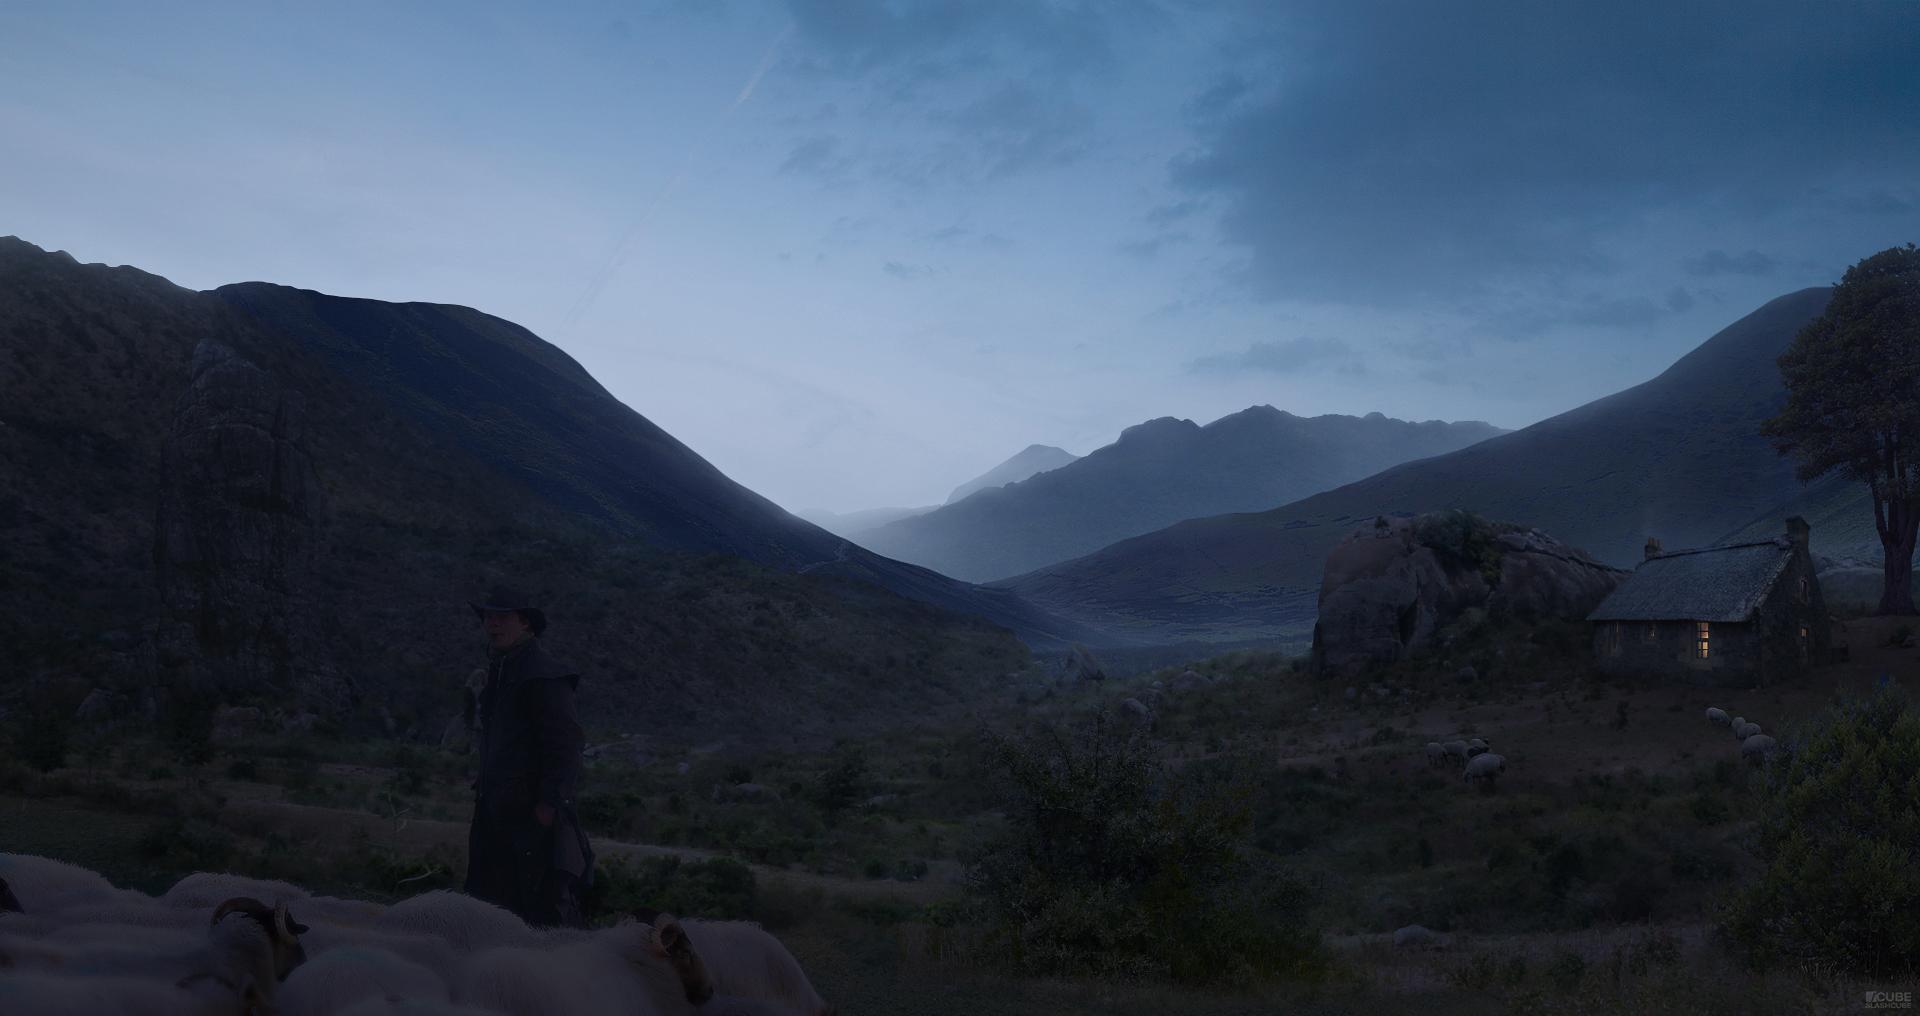 Moody Evening Valley